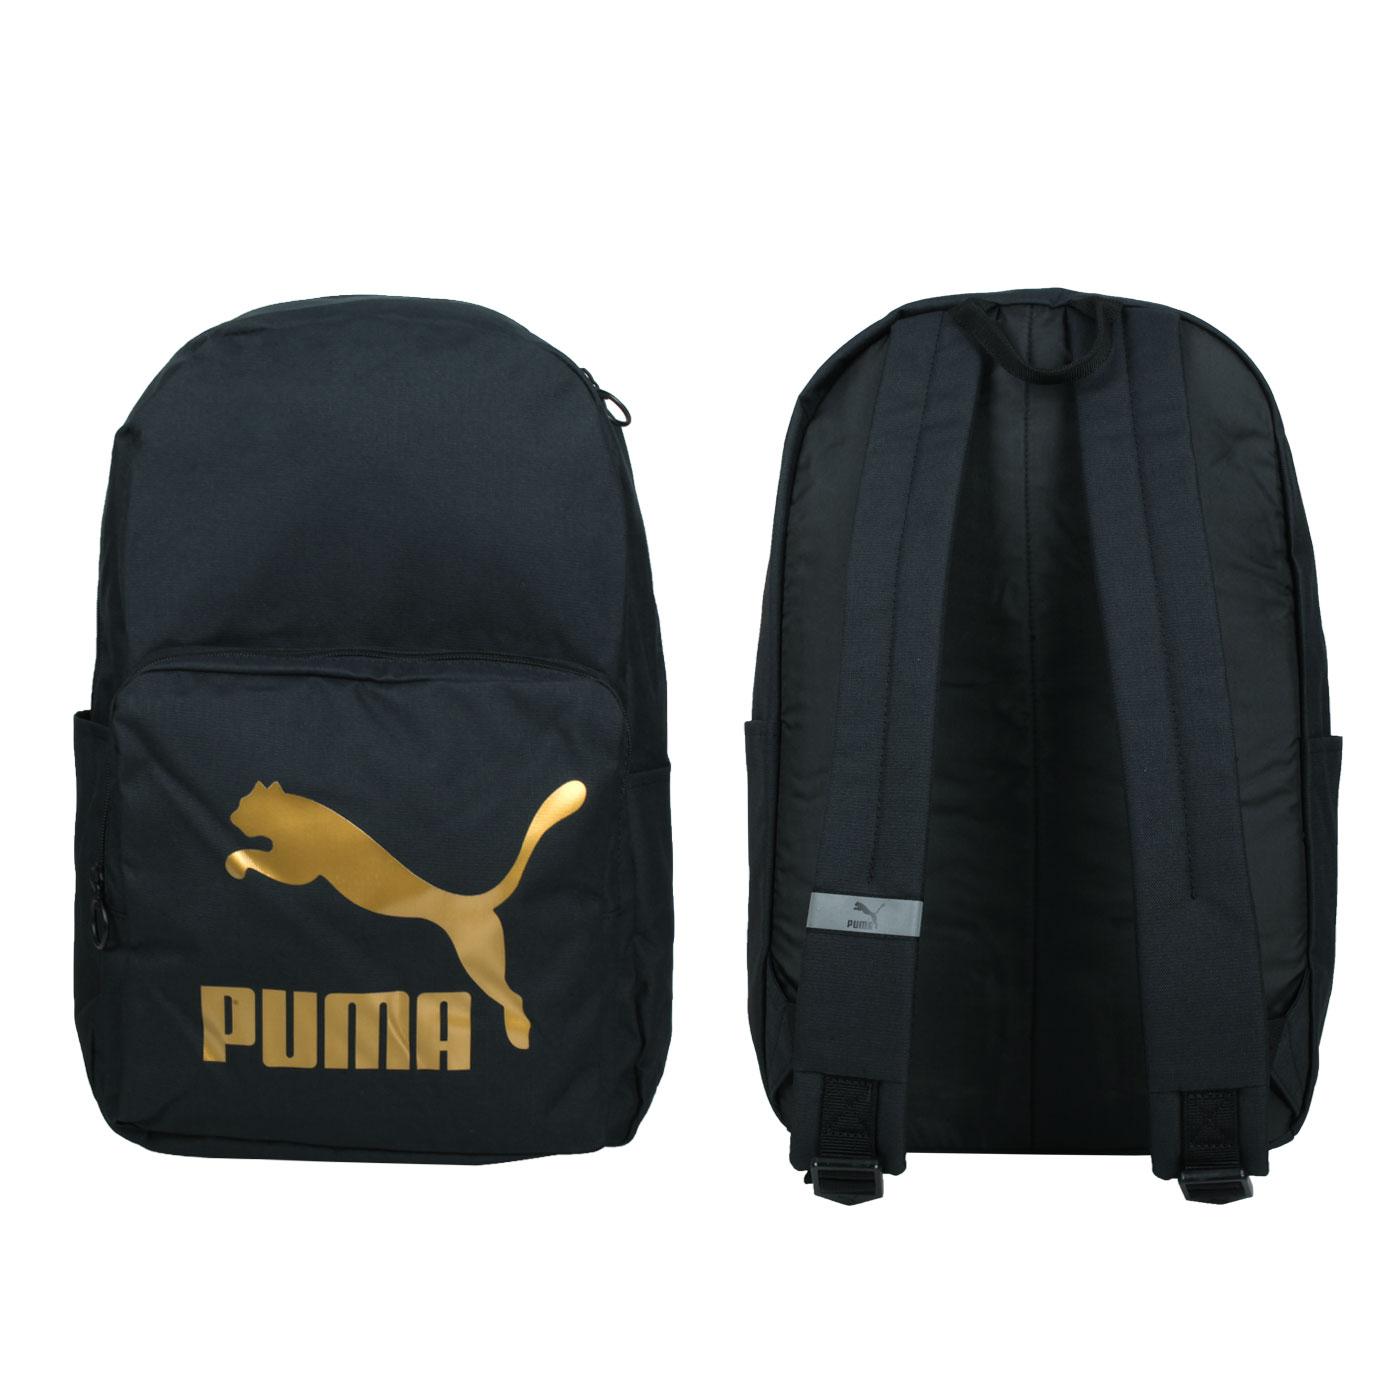 PUMA 大型後背包 07800401 - 黑金